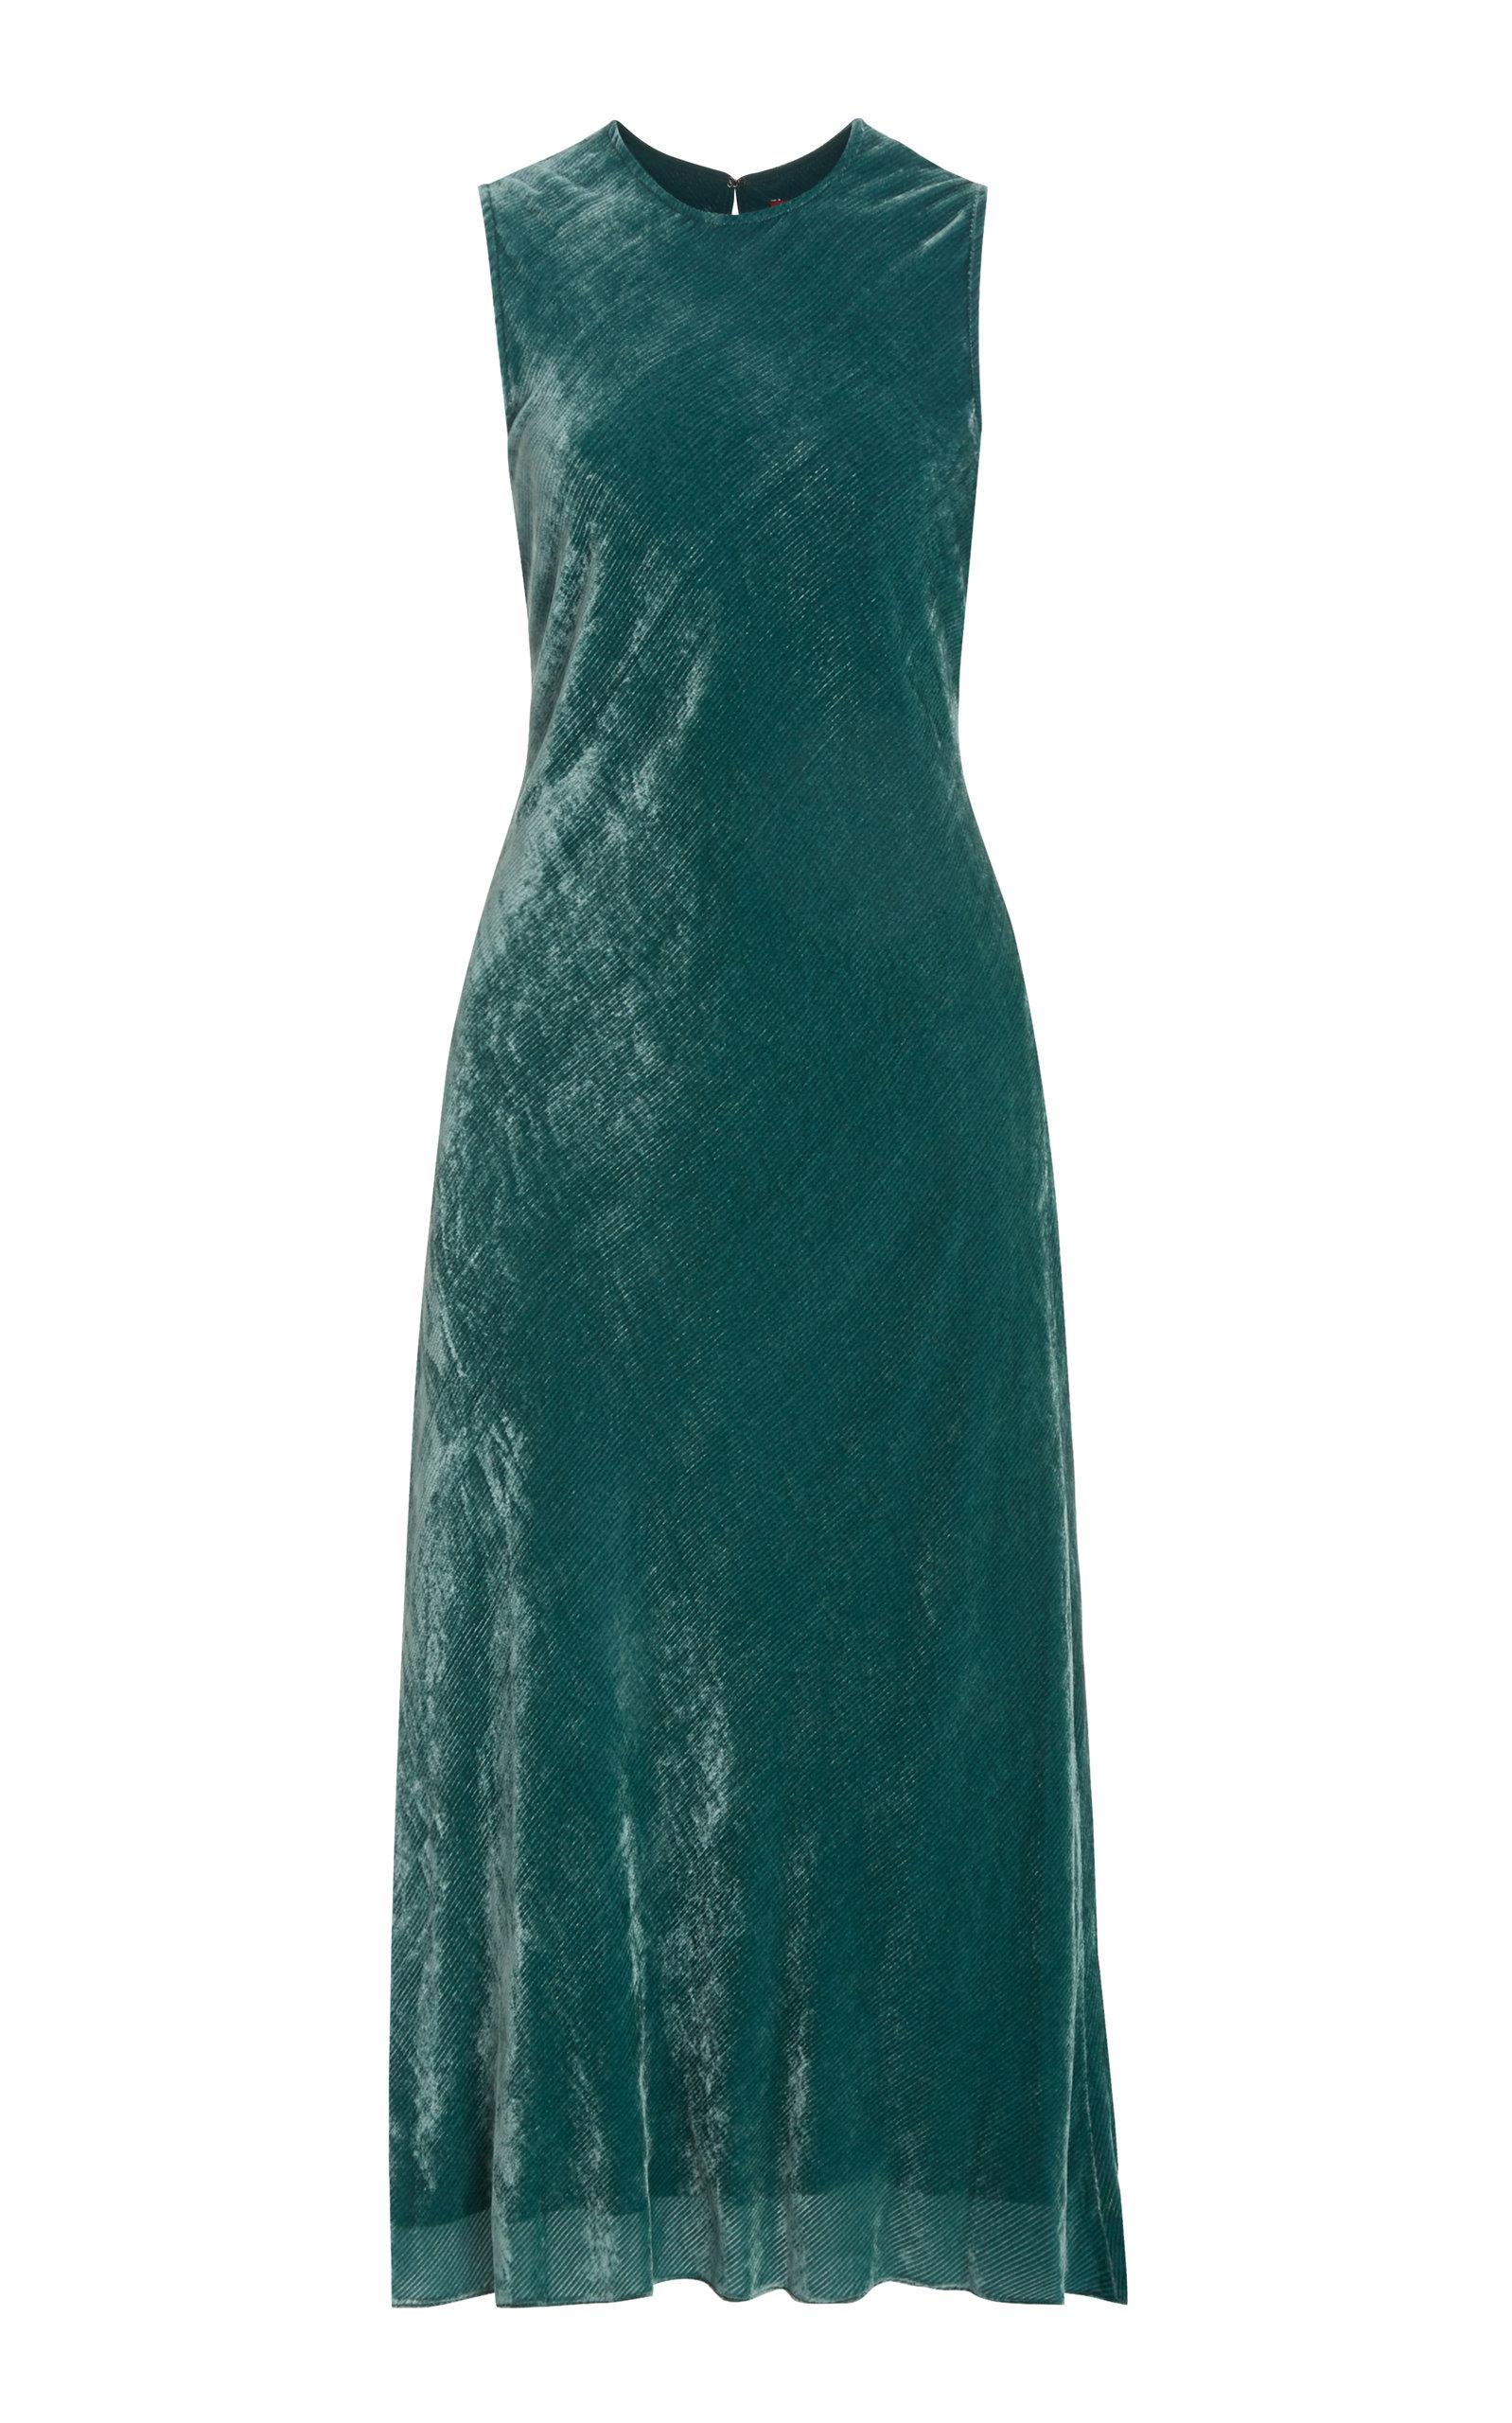 Buy Sies Marjan Viv Silk-Cotton Velvet Corduroy Midi Dress online, shop Sies Marjan at the best price